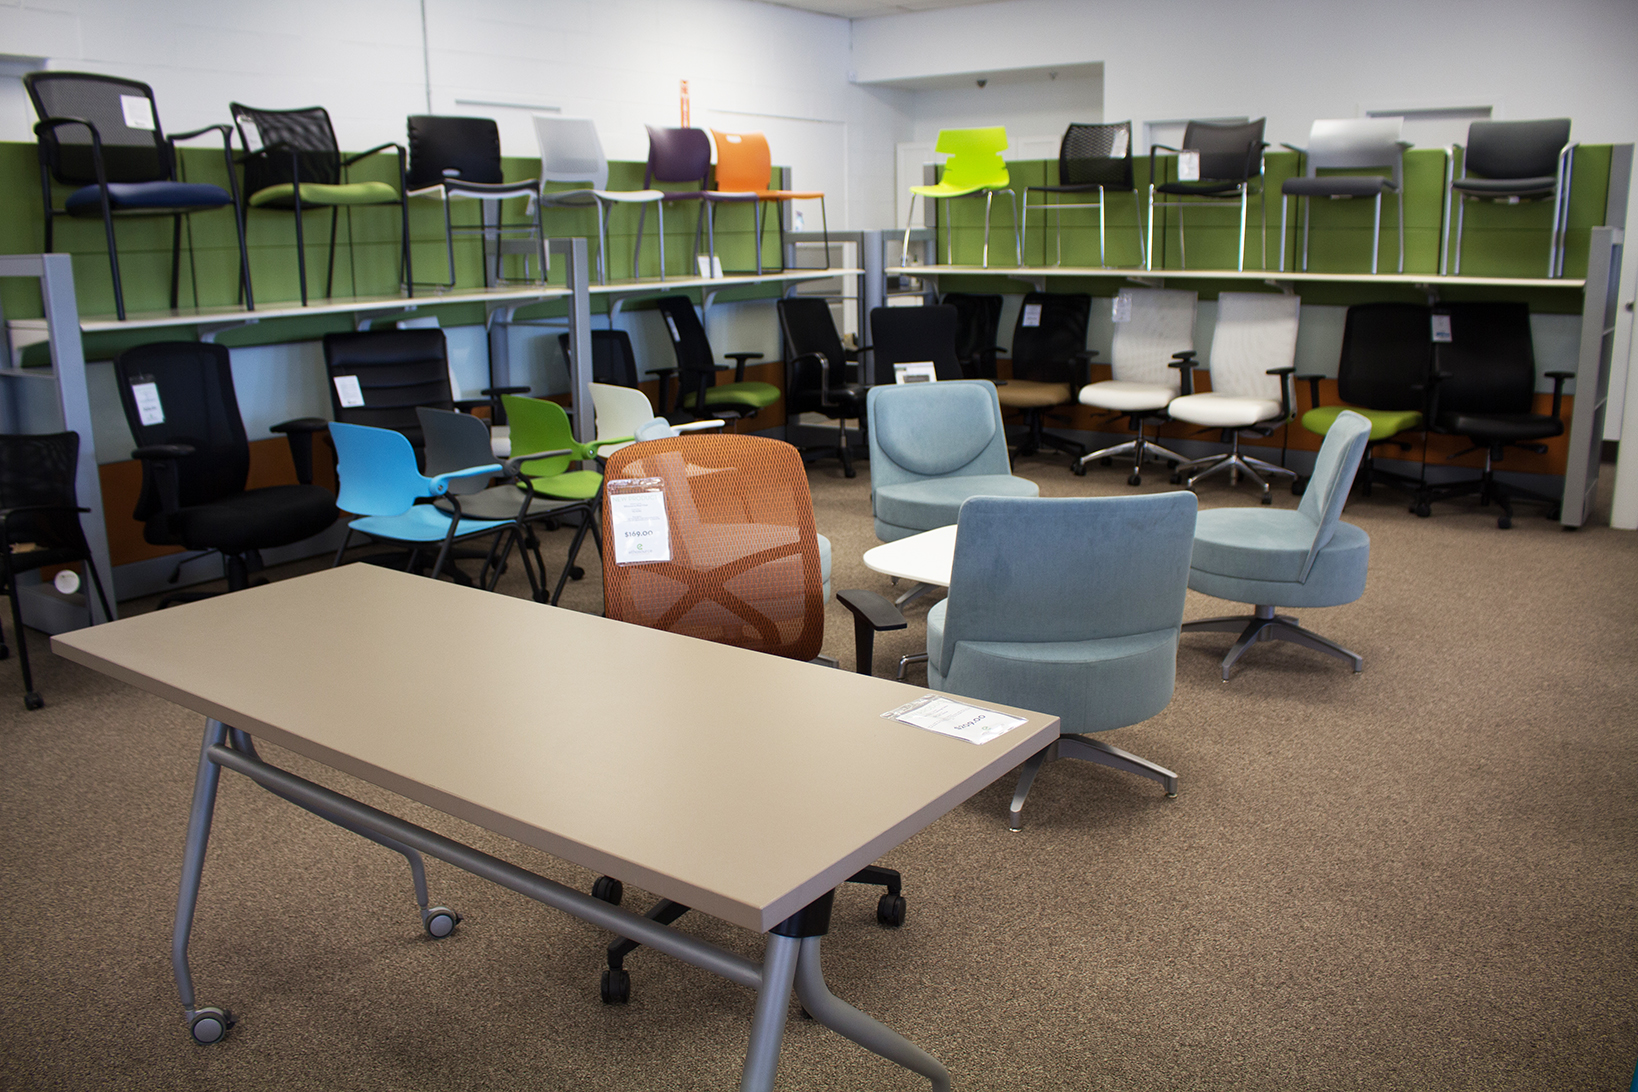 denver office furniture showroom. Explore Our Showroom Denver Office Furniture 0